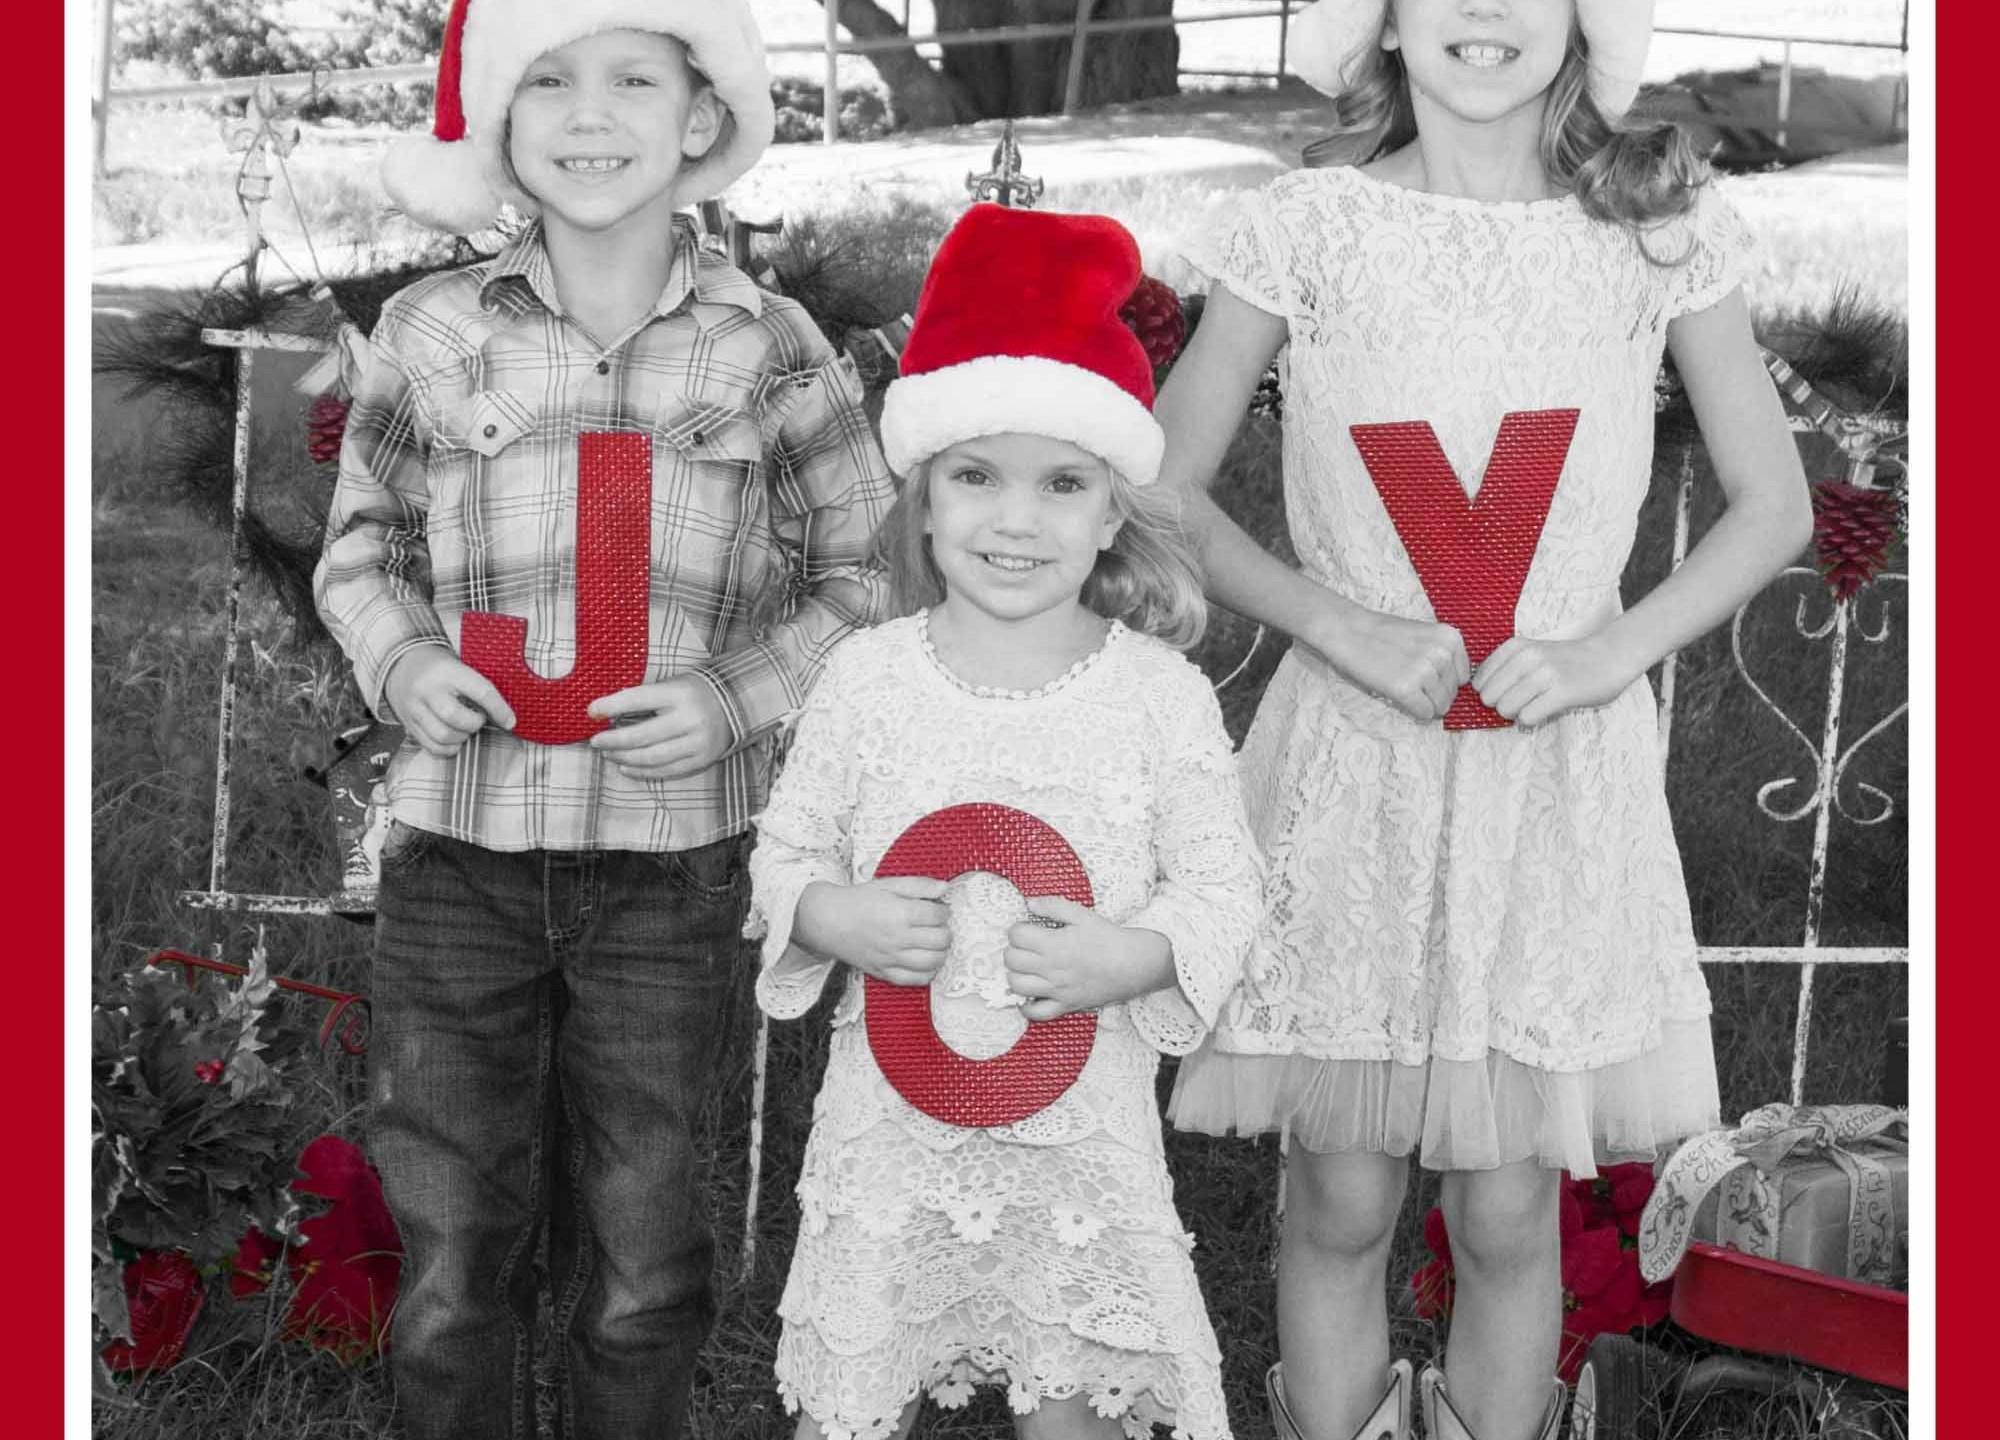 adorable christmas childrens poses, family christmas photos, cutest childrens holdiay poses, on-site photography buckeye, az